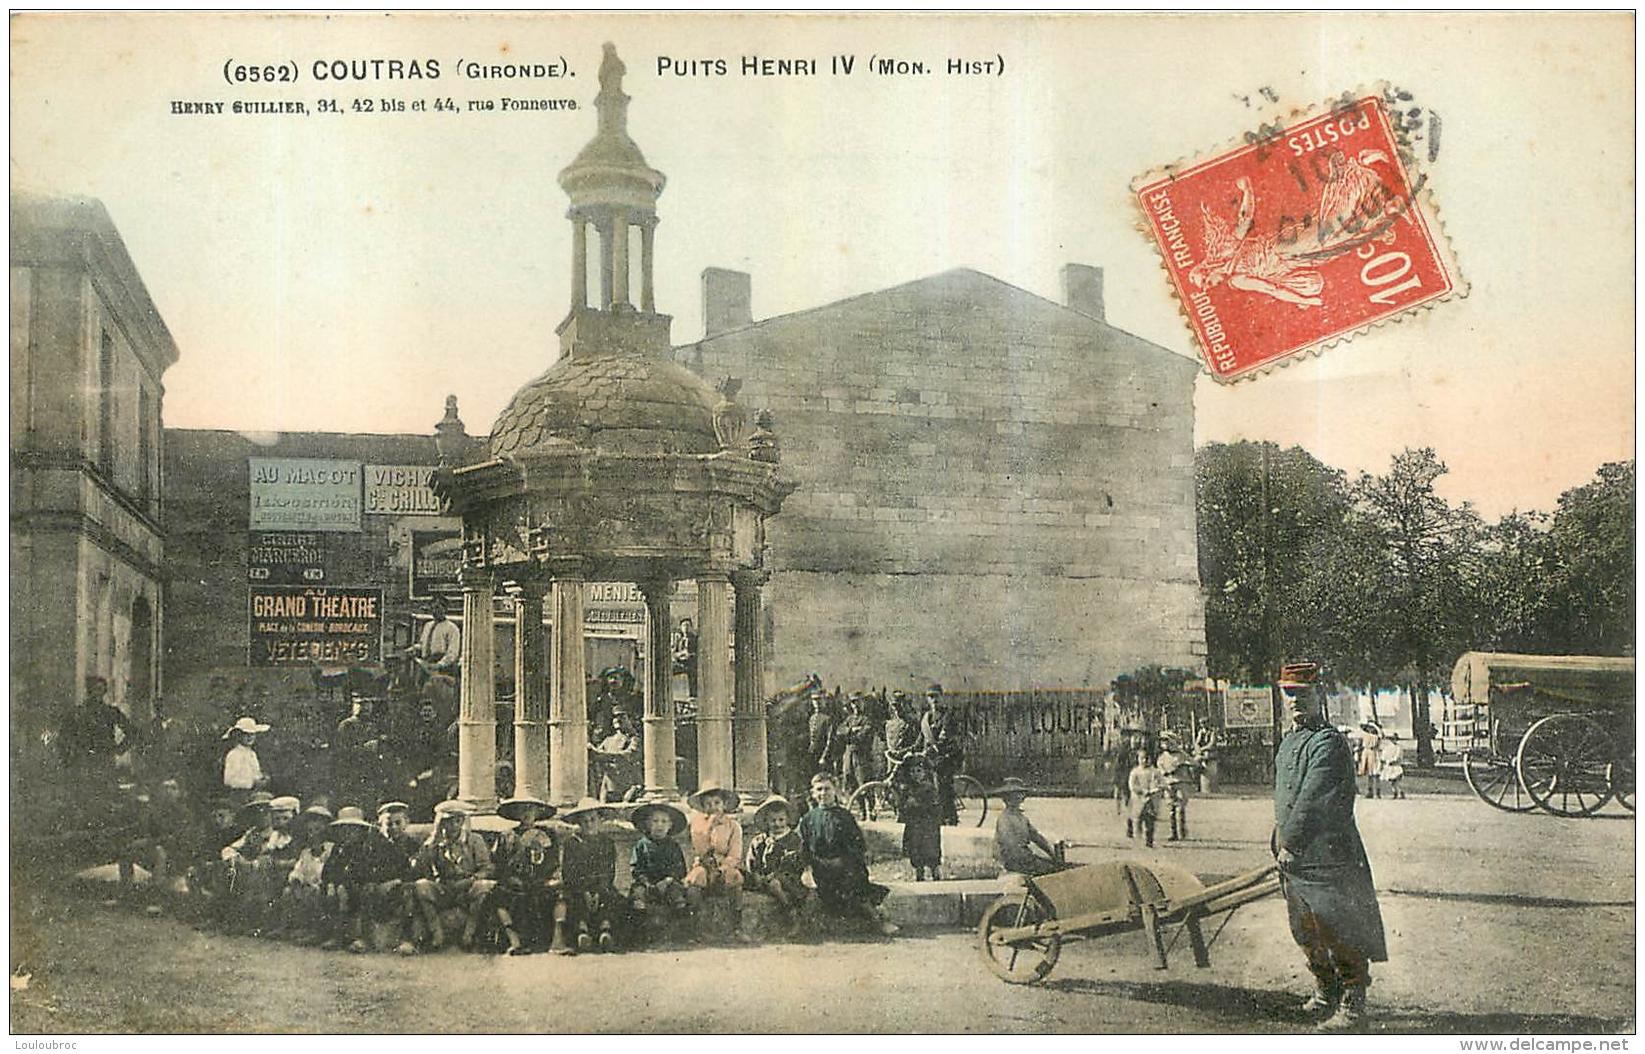 RARE COUTRAS PUITS HENRI IV EDITION  HENRY GUILLIER COULEUR - France